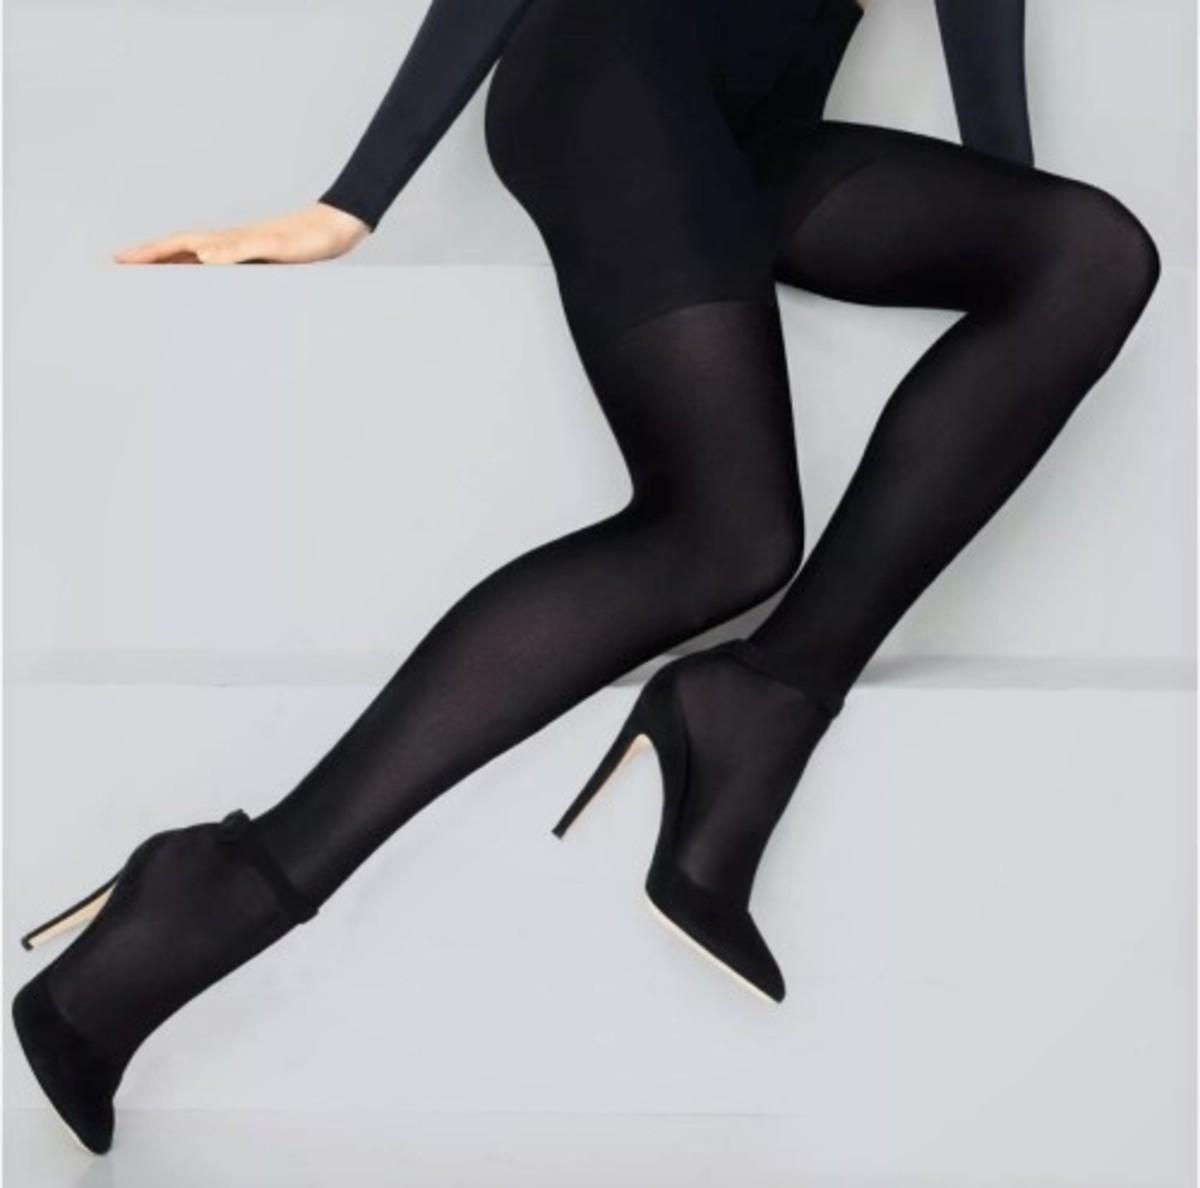 Black tights!